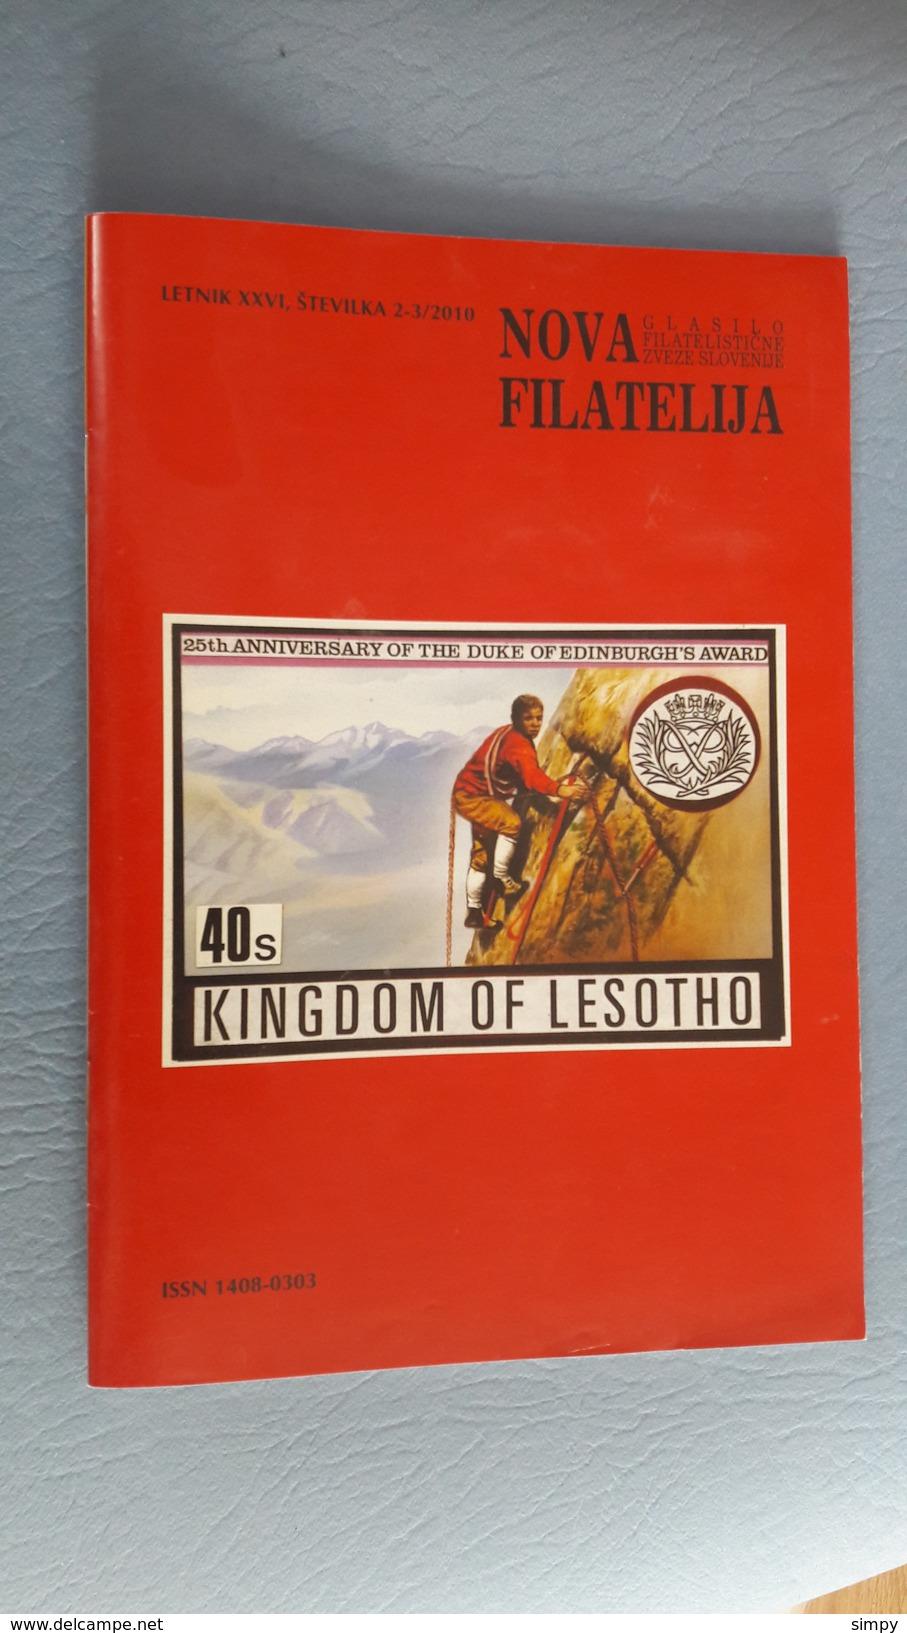 Slovenia - Philatelic Bulletin Nova Filatelija 2-3/2010 - Letteratura